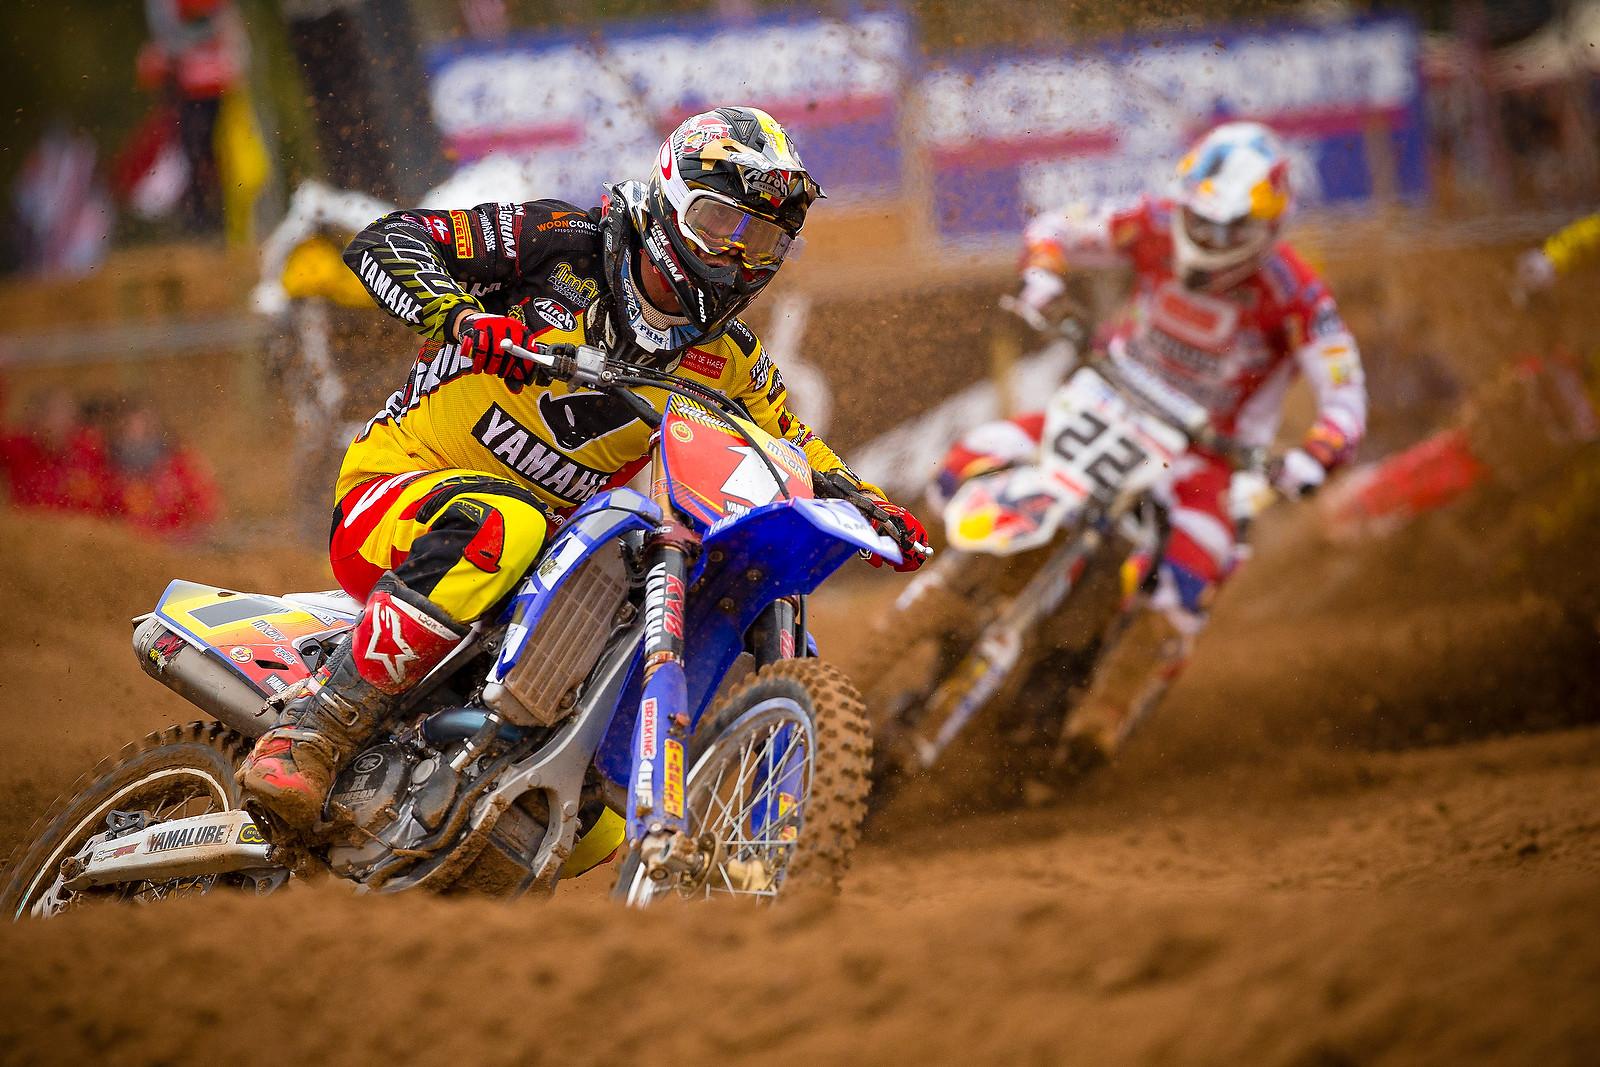 Jeremy van Horebeek  - kardy - Motocross Pictures - Vital MX